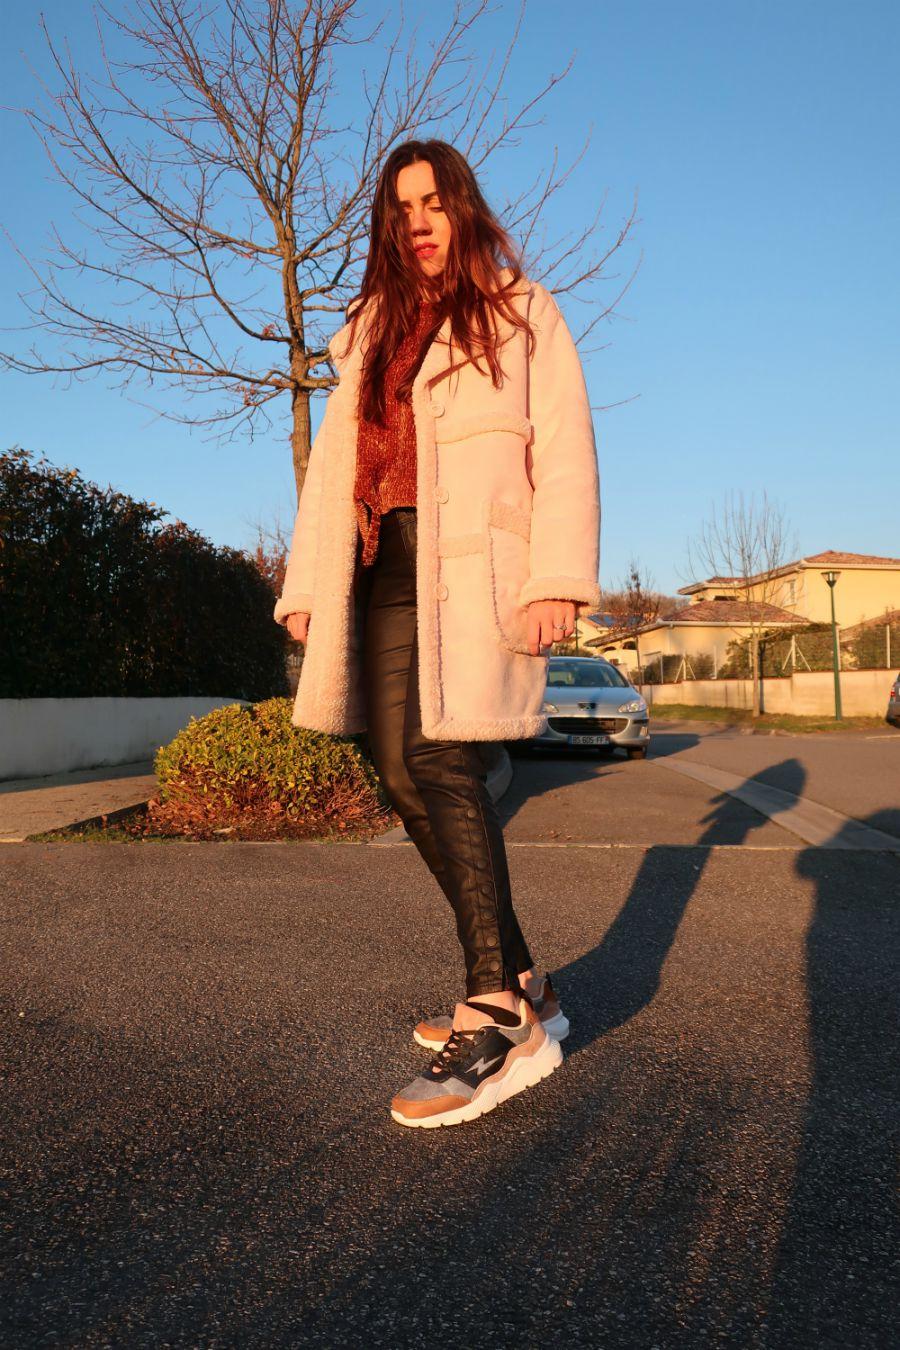 tendance basket onlybrightness #tendance #fashion #baskets #sneakers #onlybrightness